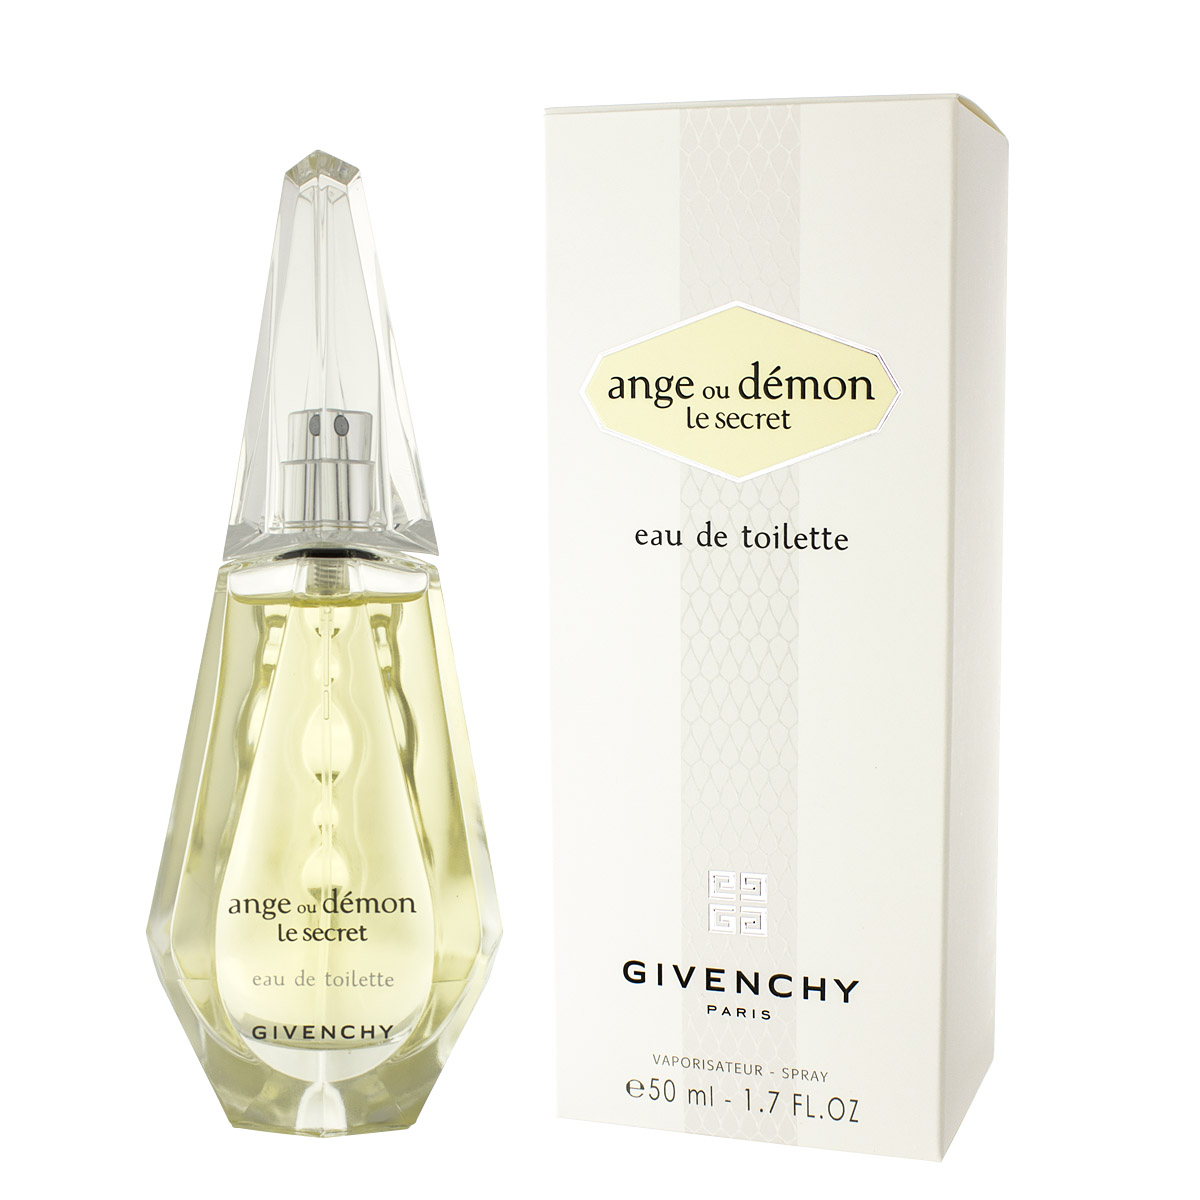 Givenchy Ange Ou Demon (Ange Ou Etrange) Le Secret EDT 50 ml